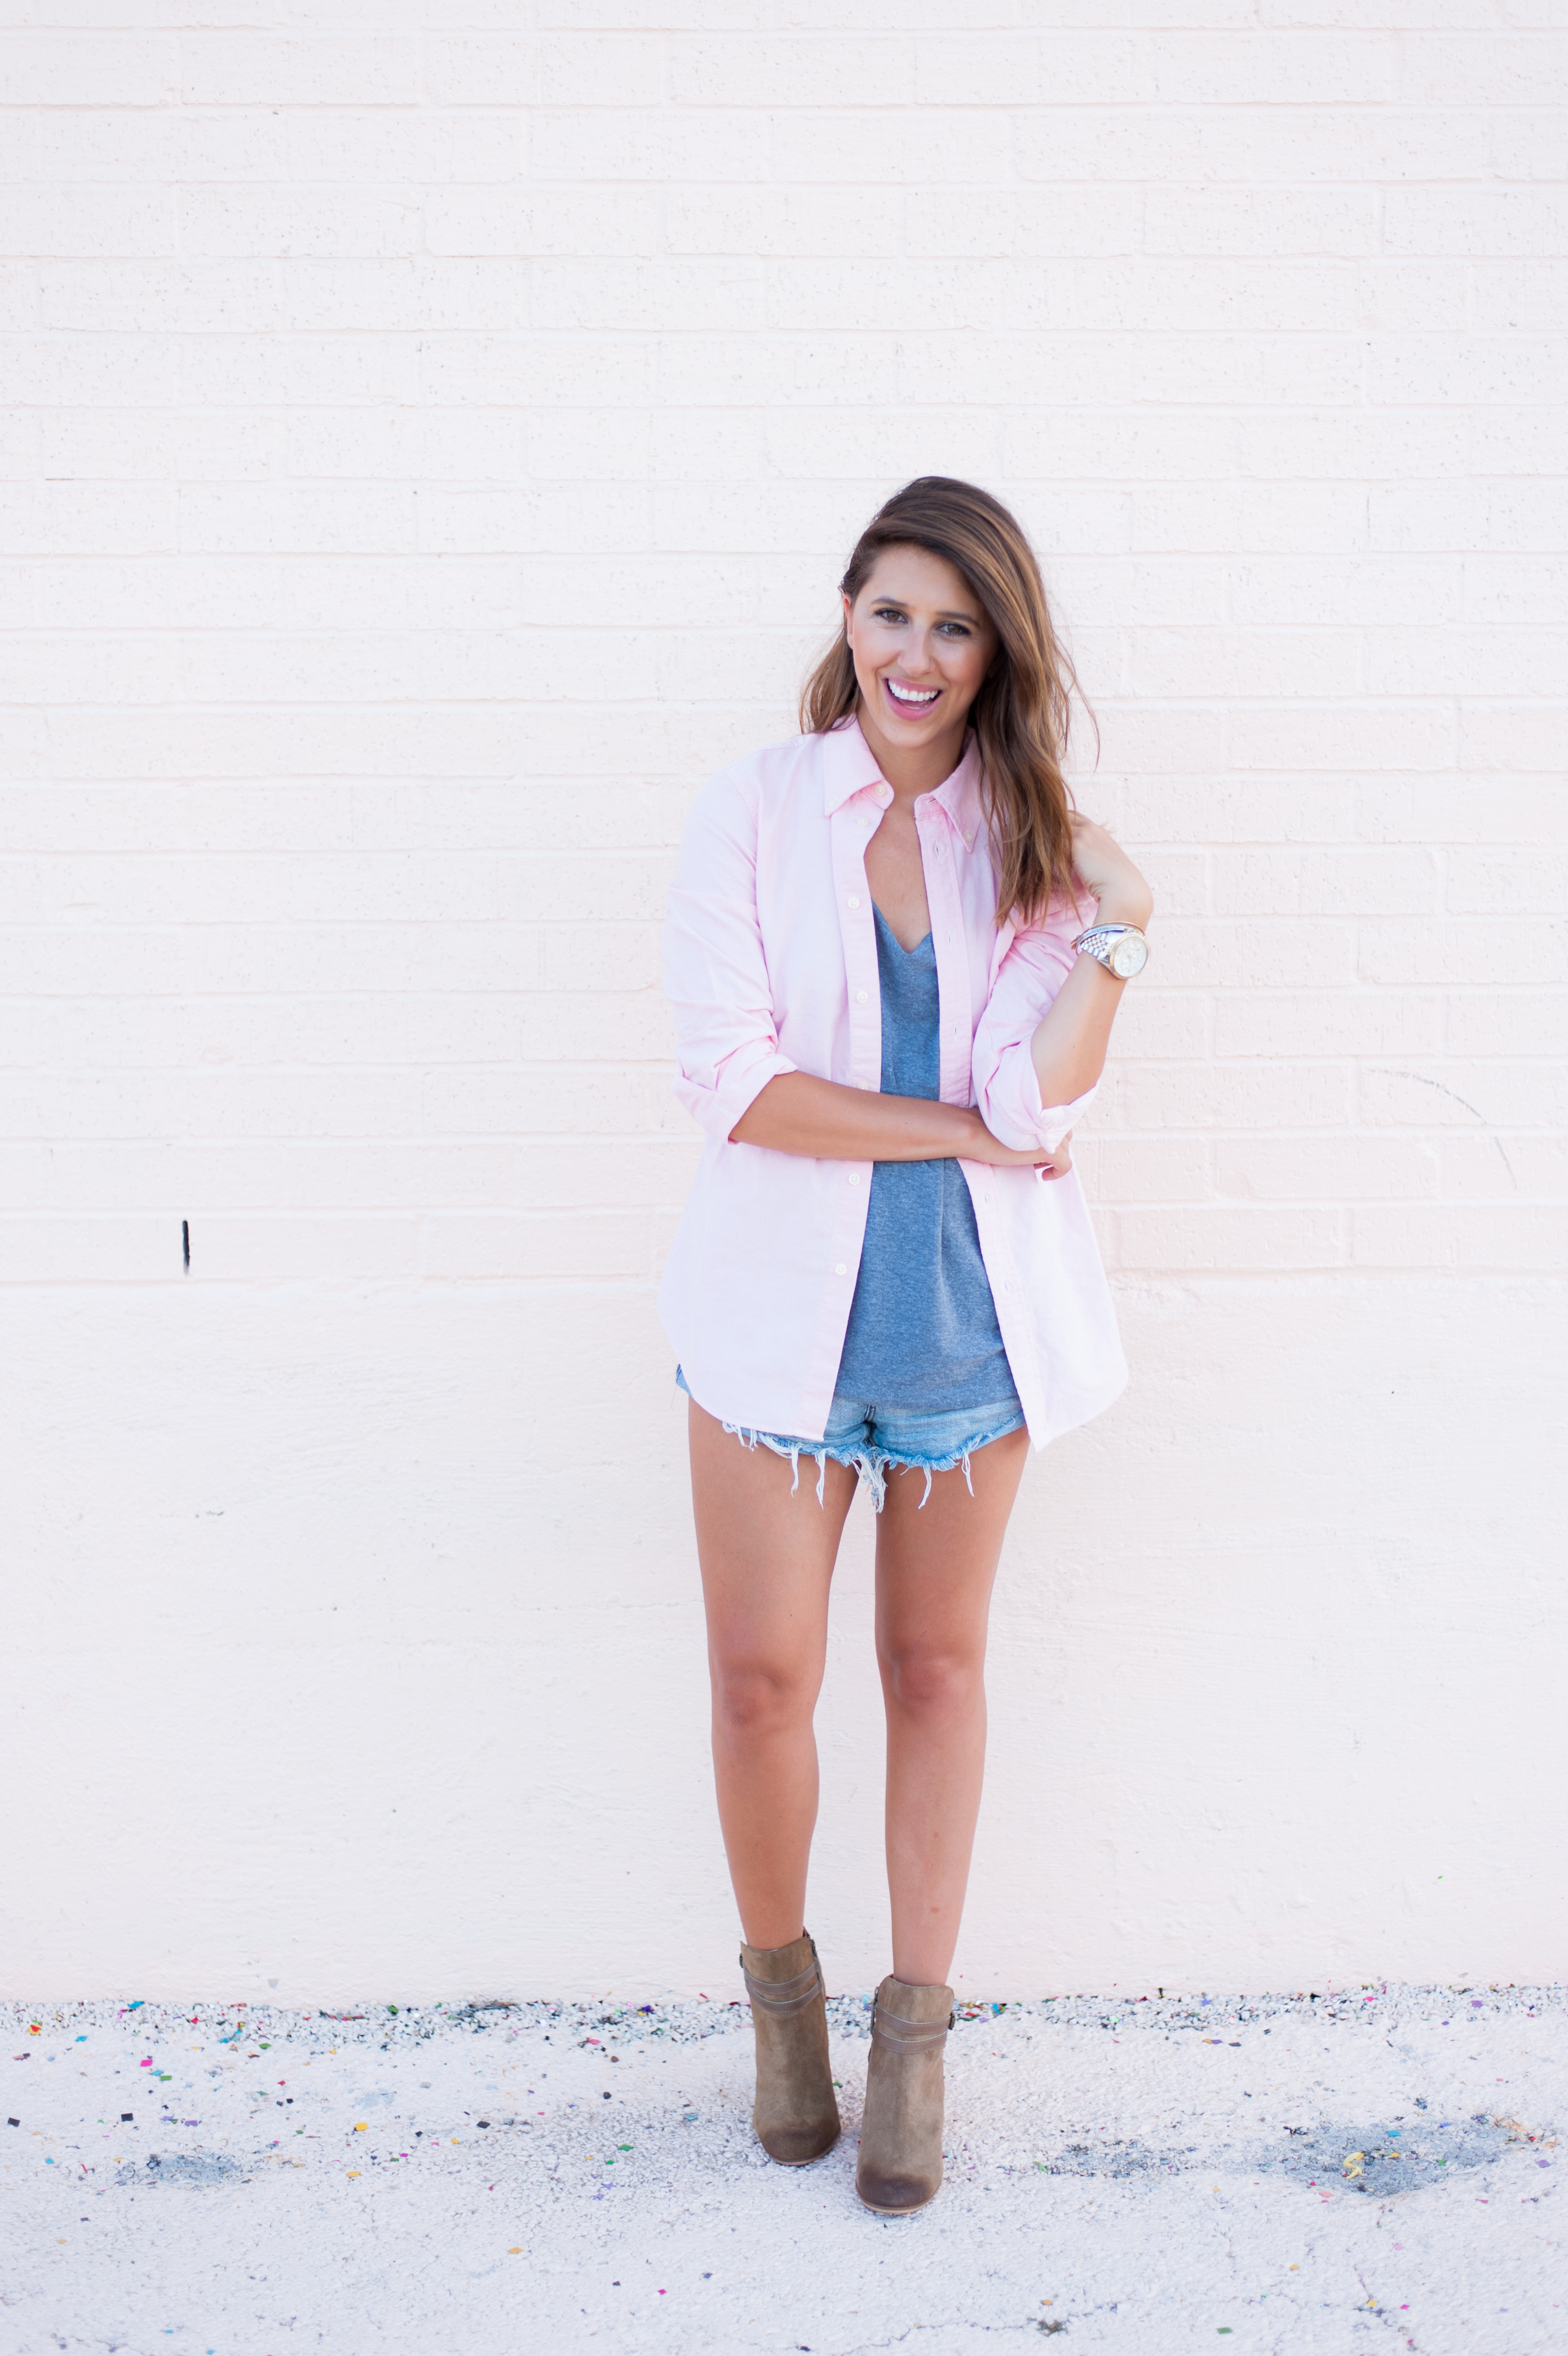 dress_up_buttercup_dede_raad_houston_fashion_fashion_blog (8 of 10)